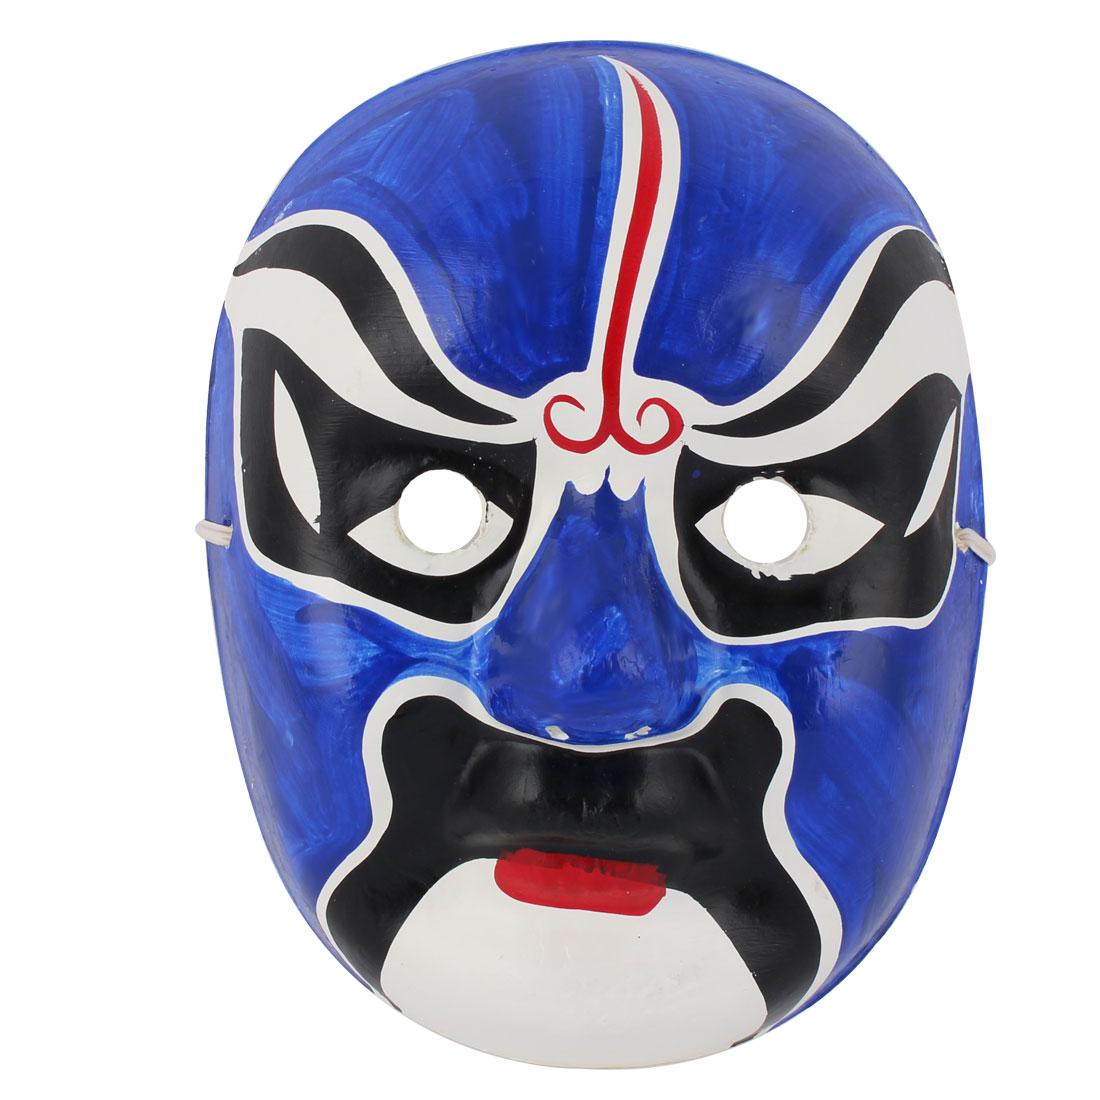 Halloween Karneval Cosplay Parties Unisex Chinese Beijing Opera Facial Makeup Mask